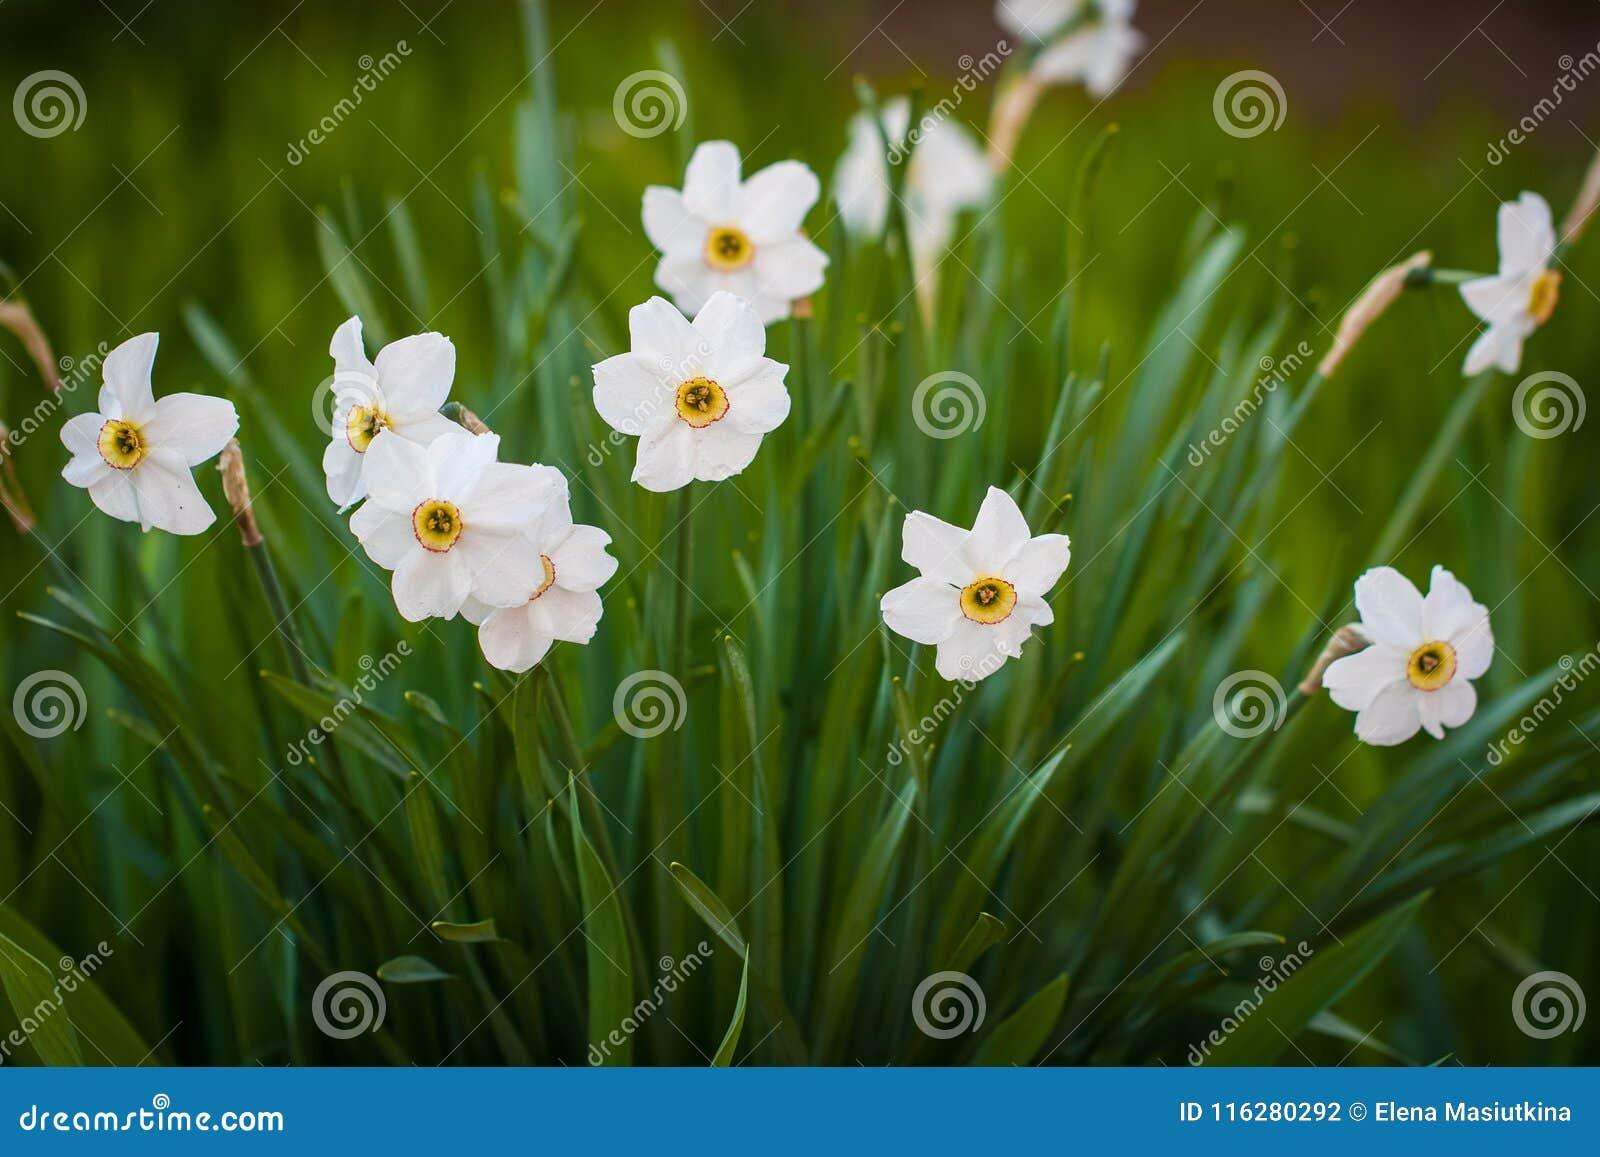 De Bladeren die van bloemennarcissus color white with green in Tuin groeien